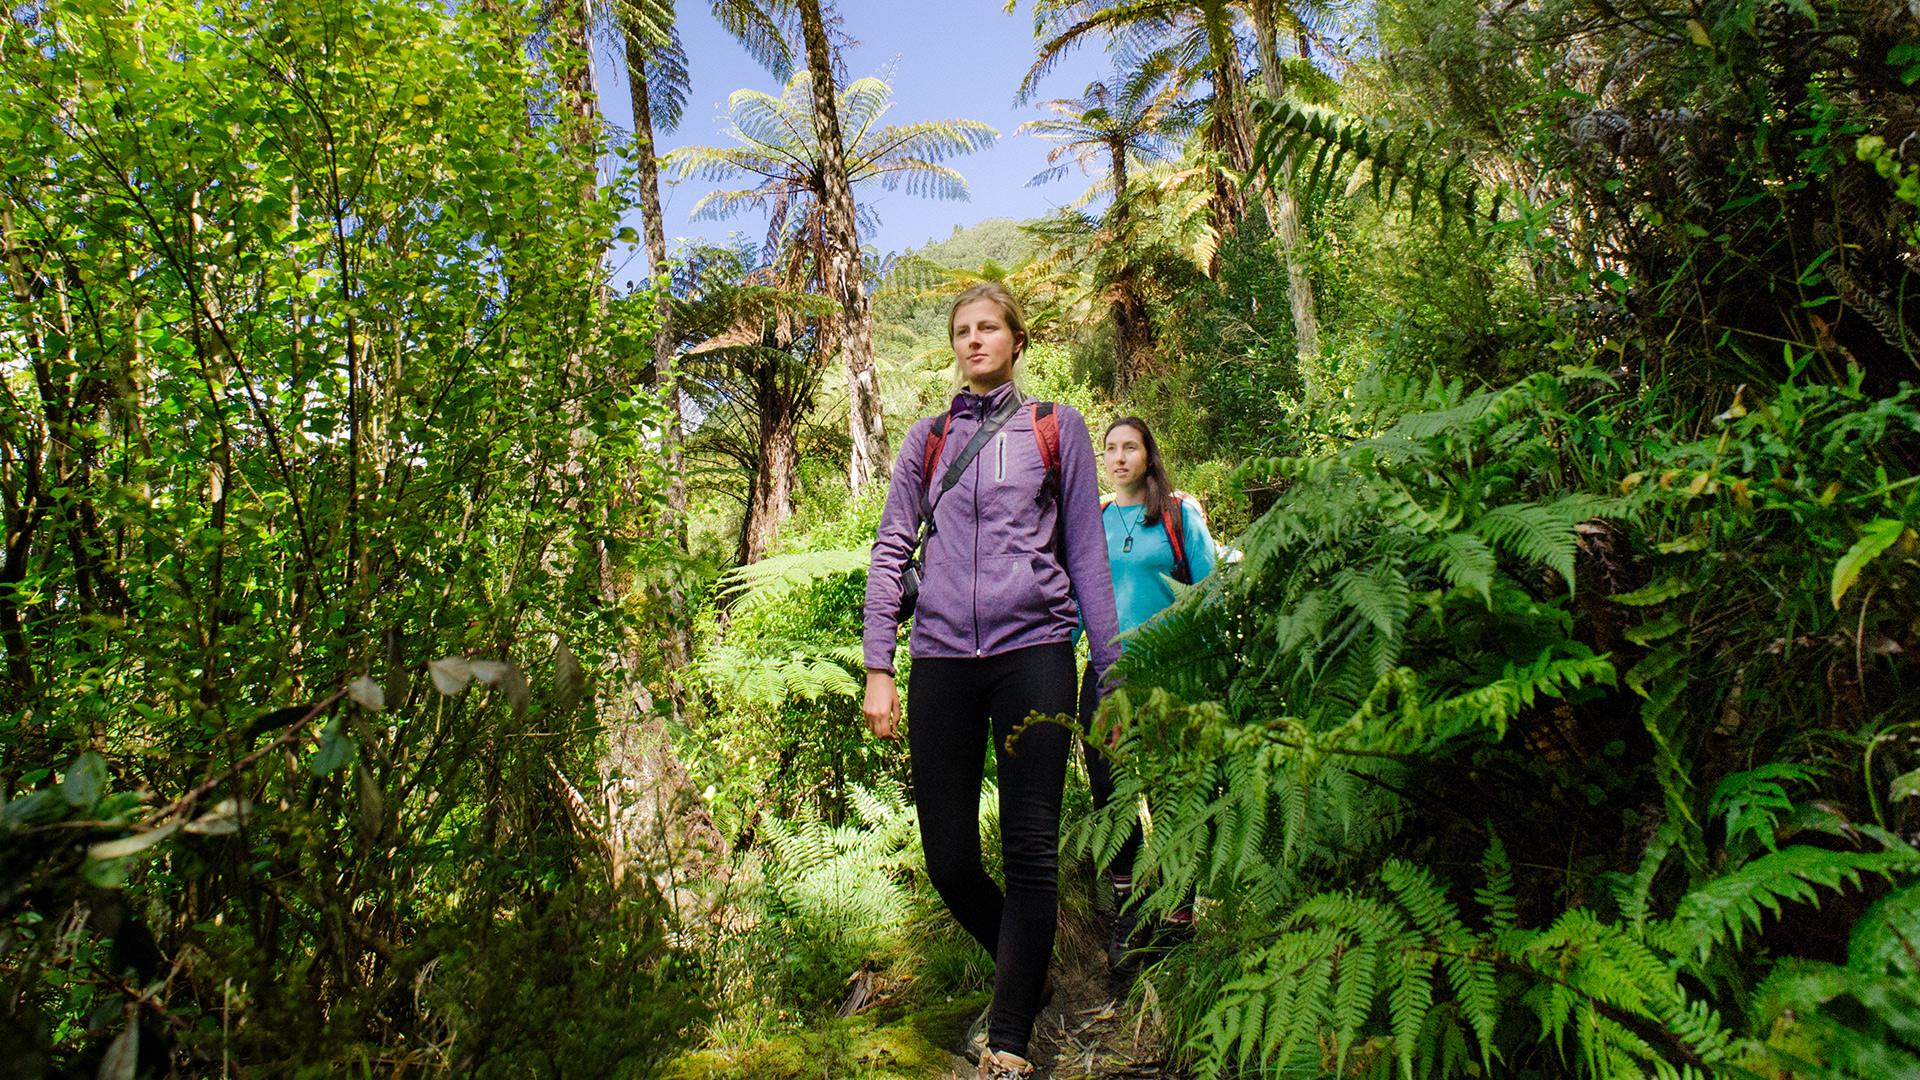 Walking and hiking in the Lake Tarawera area